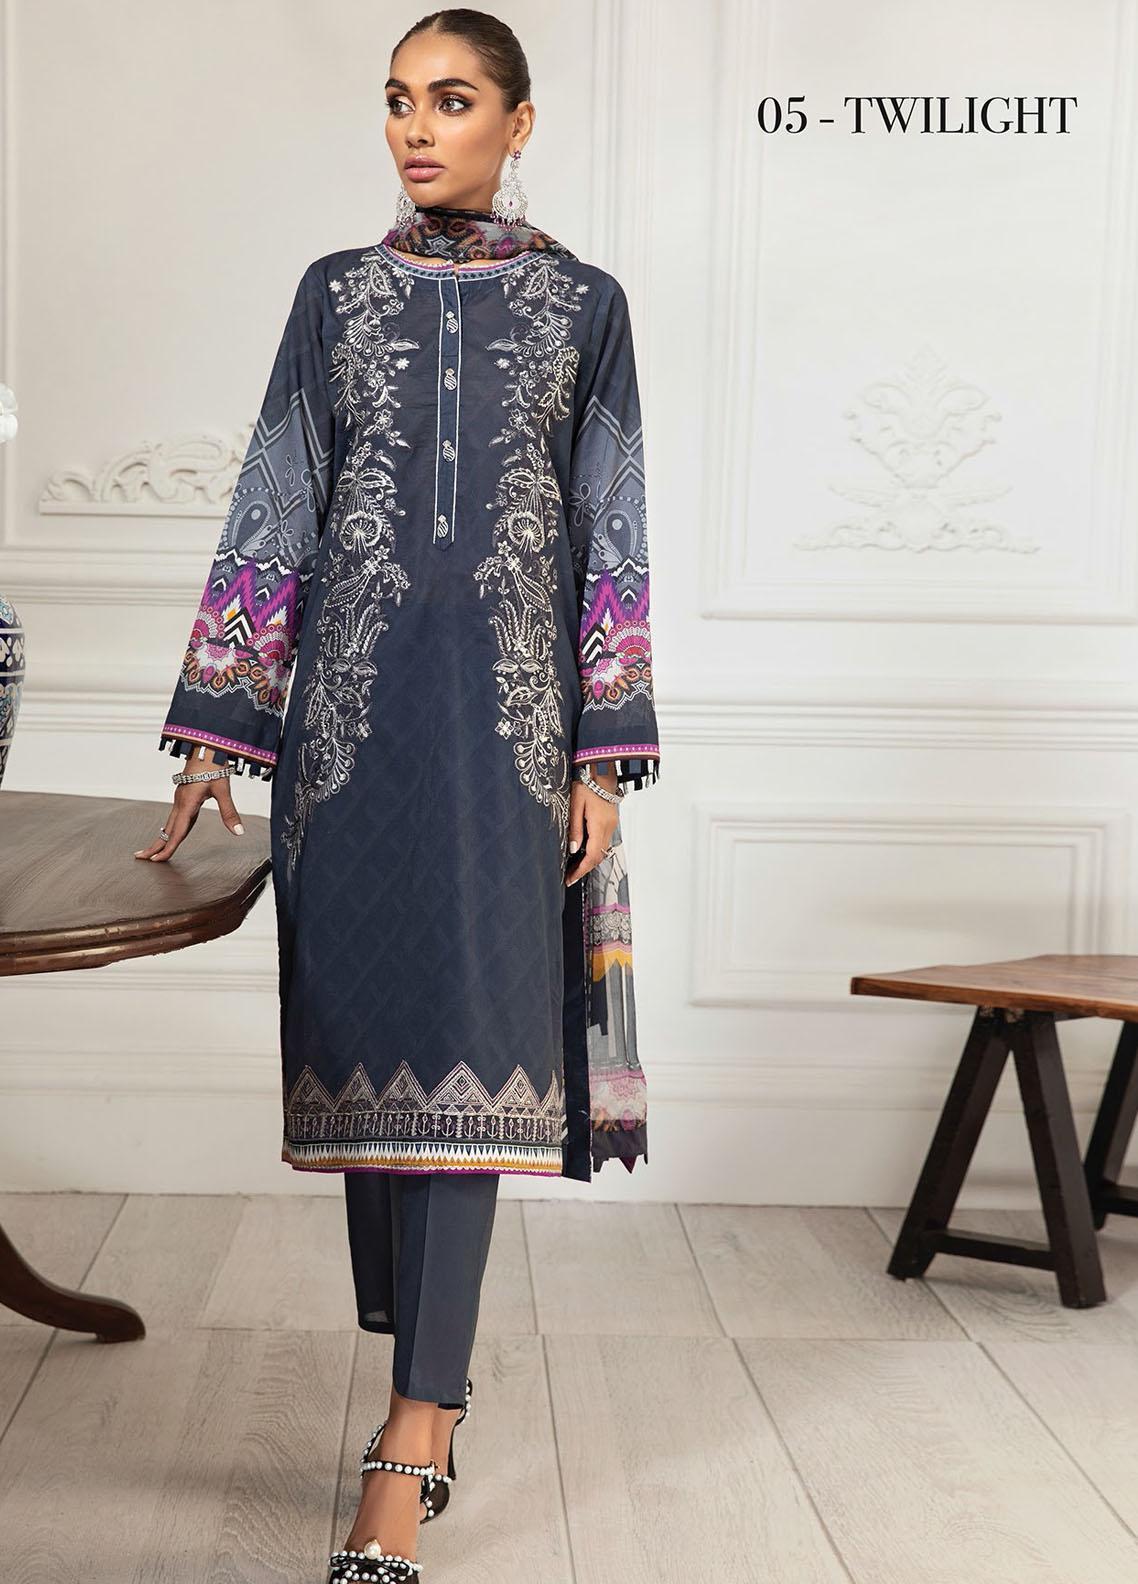 Farasha Embroidered Lawn Suits Unstitched 3 Piece FSH21-L3 05 Twilight - Festive Collection